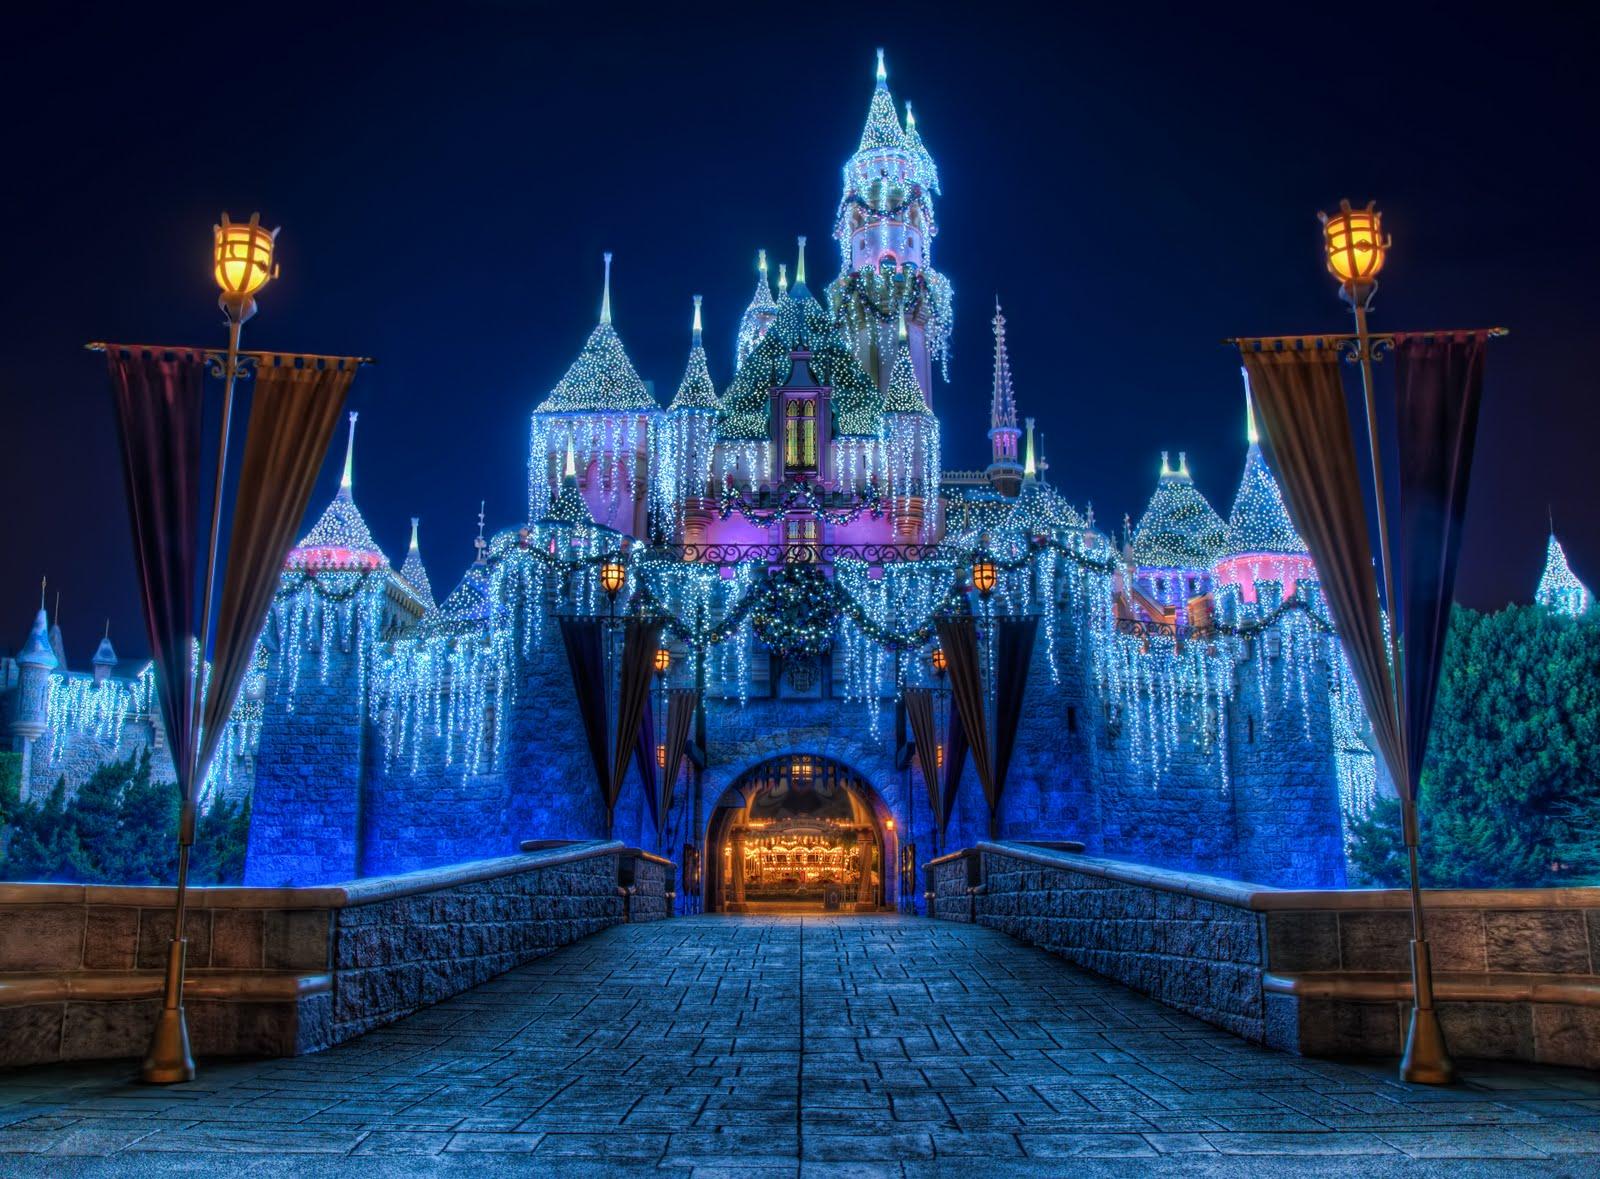 Image   Disneyland Christmas Castlejpg   DisneyWiki 1600x1179